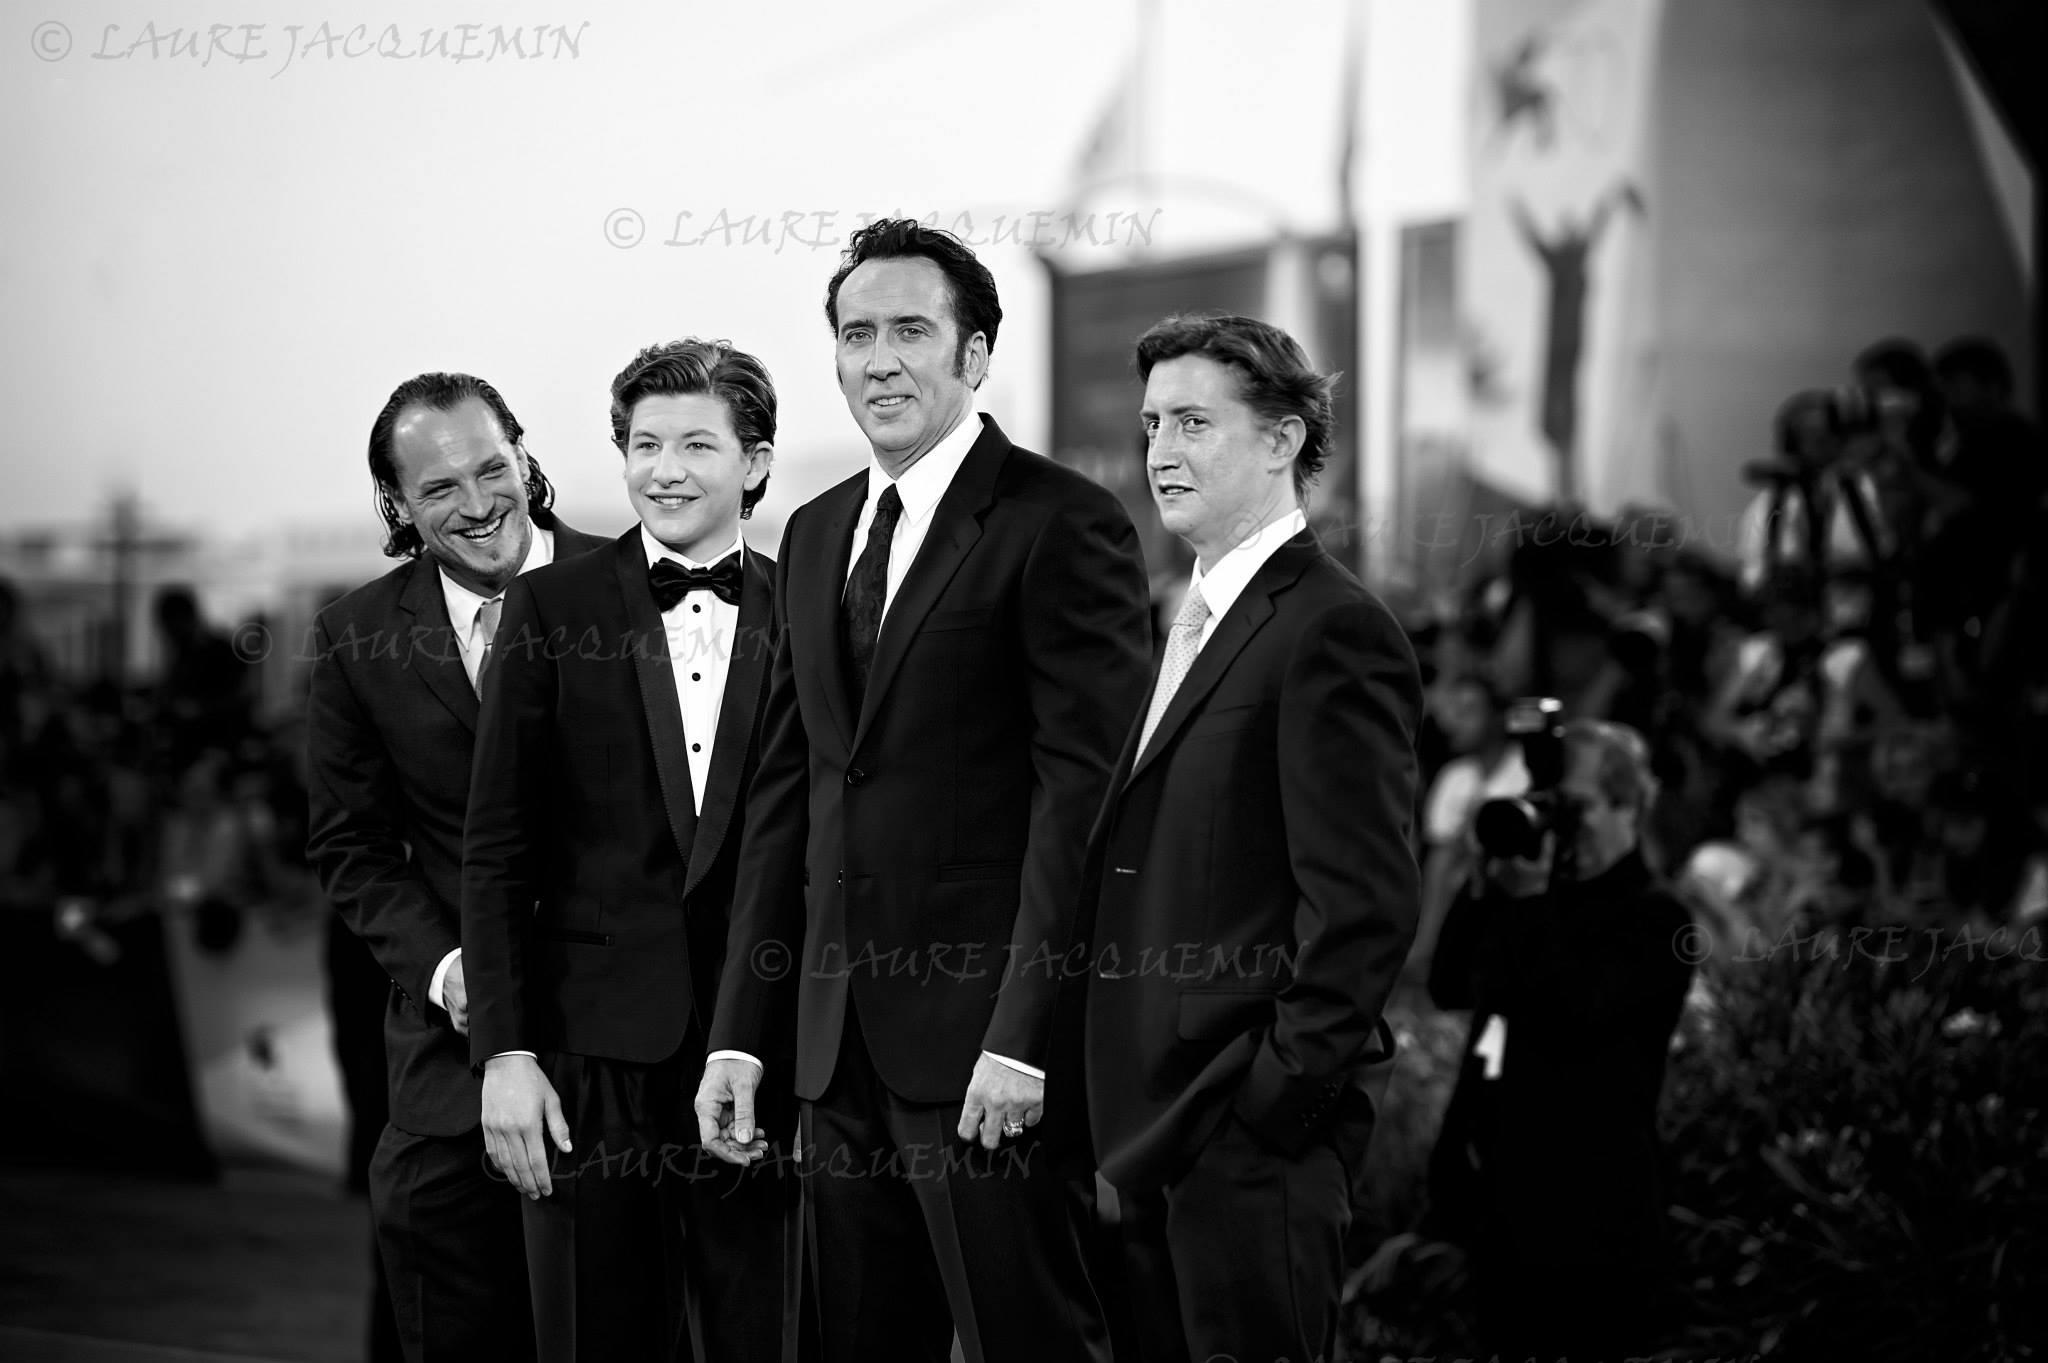 3 70TH VENICE FILM FESTIVAL laure jacquemin (5).jpg